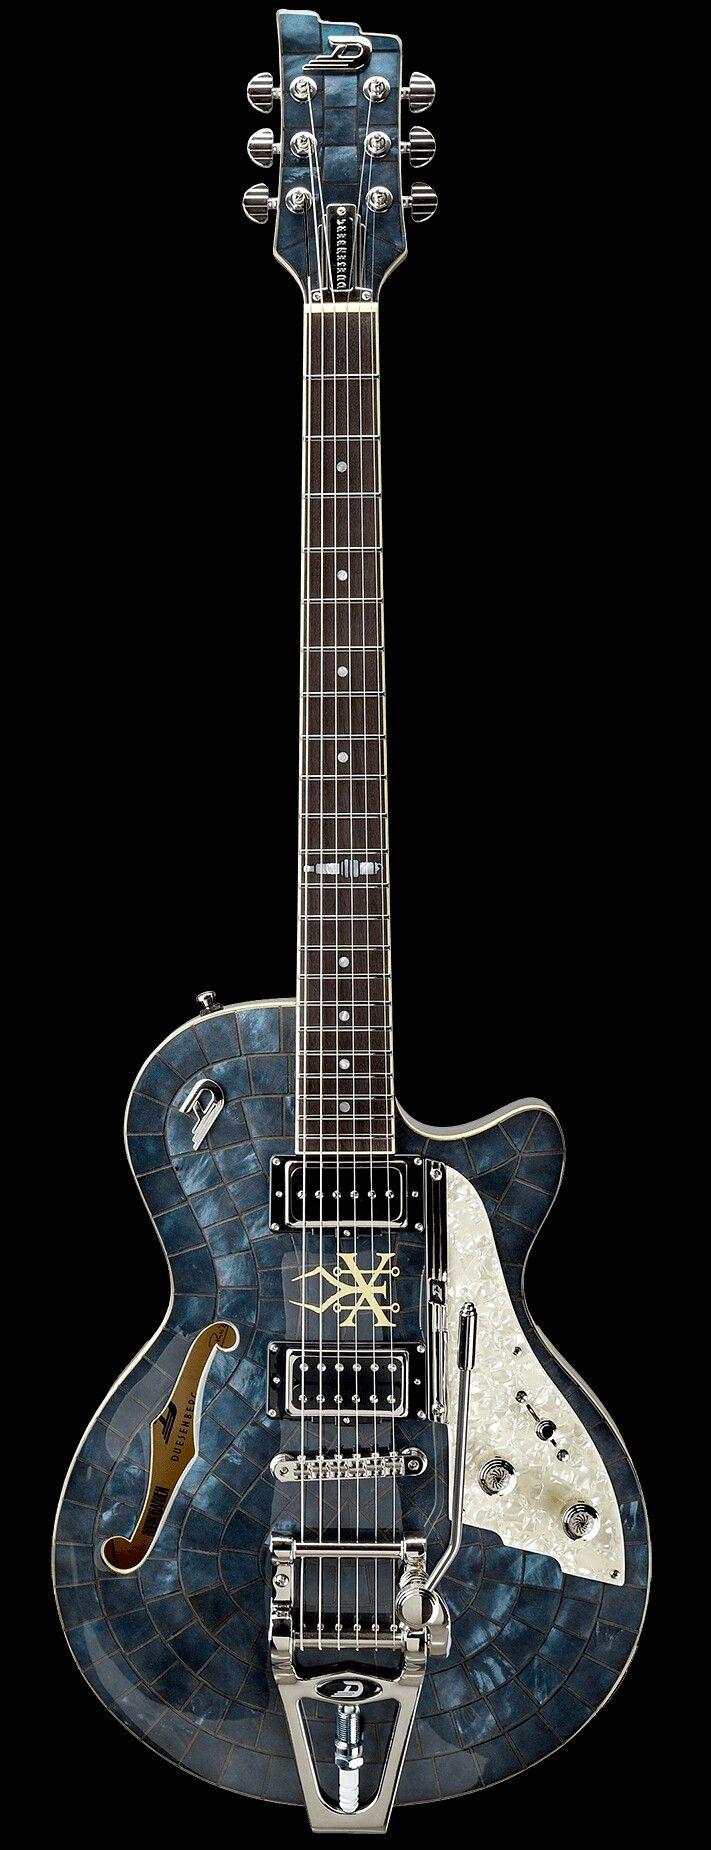 246 best Guitars images on Pinterest | Electric guitars, Custom ...